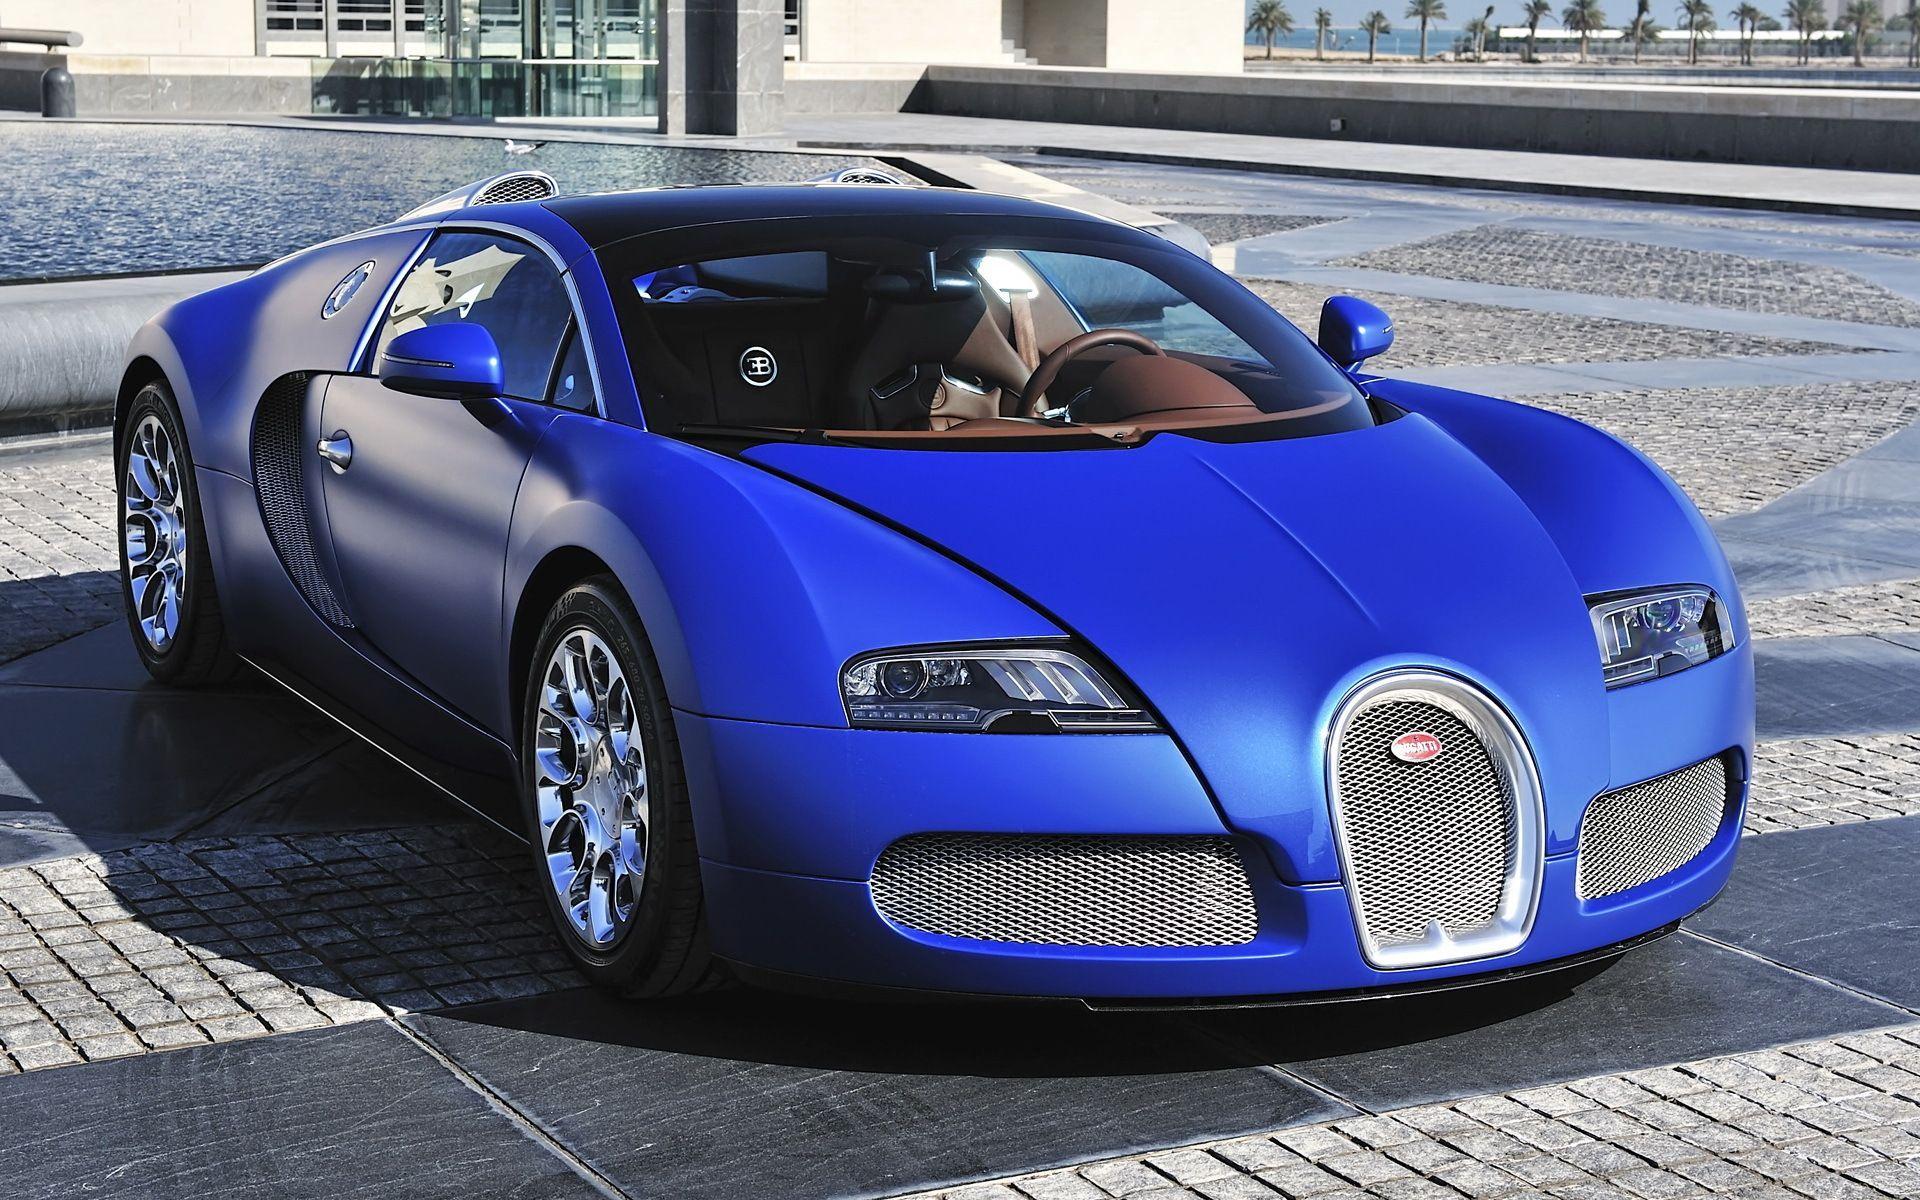 Bugatti Love This Colour Easiest 800 A Day Watch The Vid Energy Millionaires Com Weeklypay Bugatti Veyron Bugatti Cars Veyron